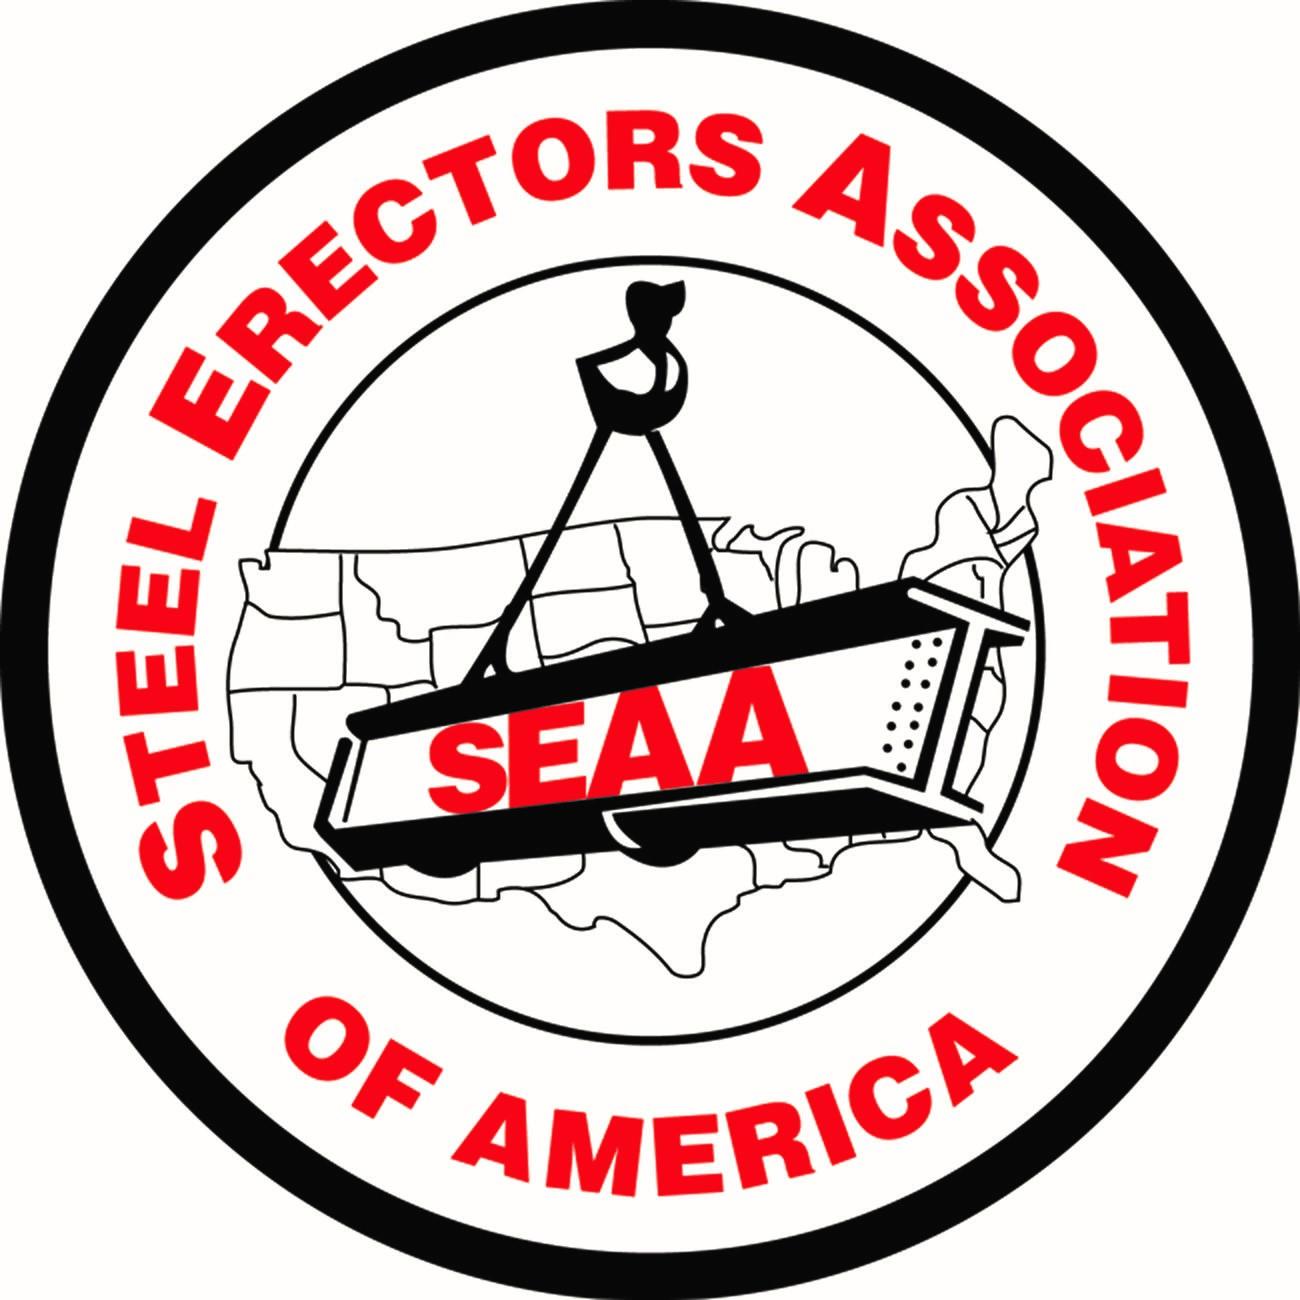 Steel Erectors Association Design Firms Improve Certification